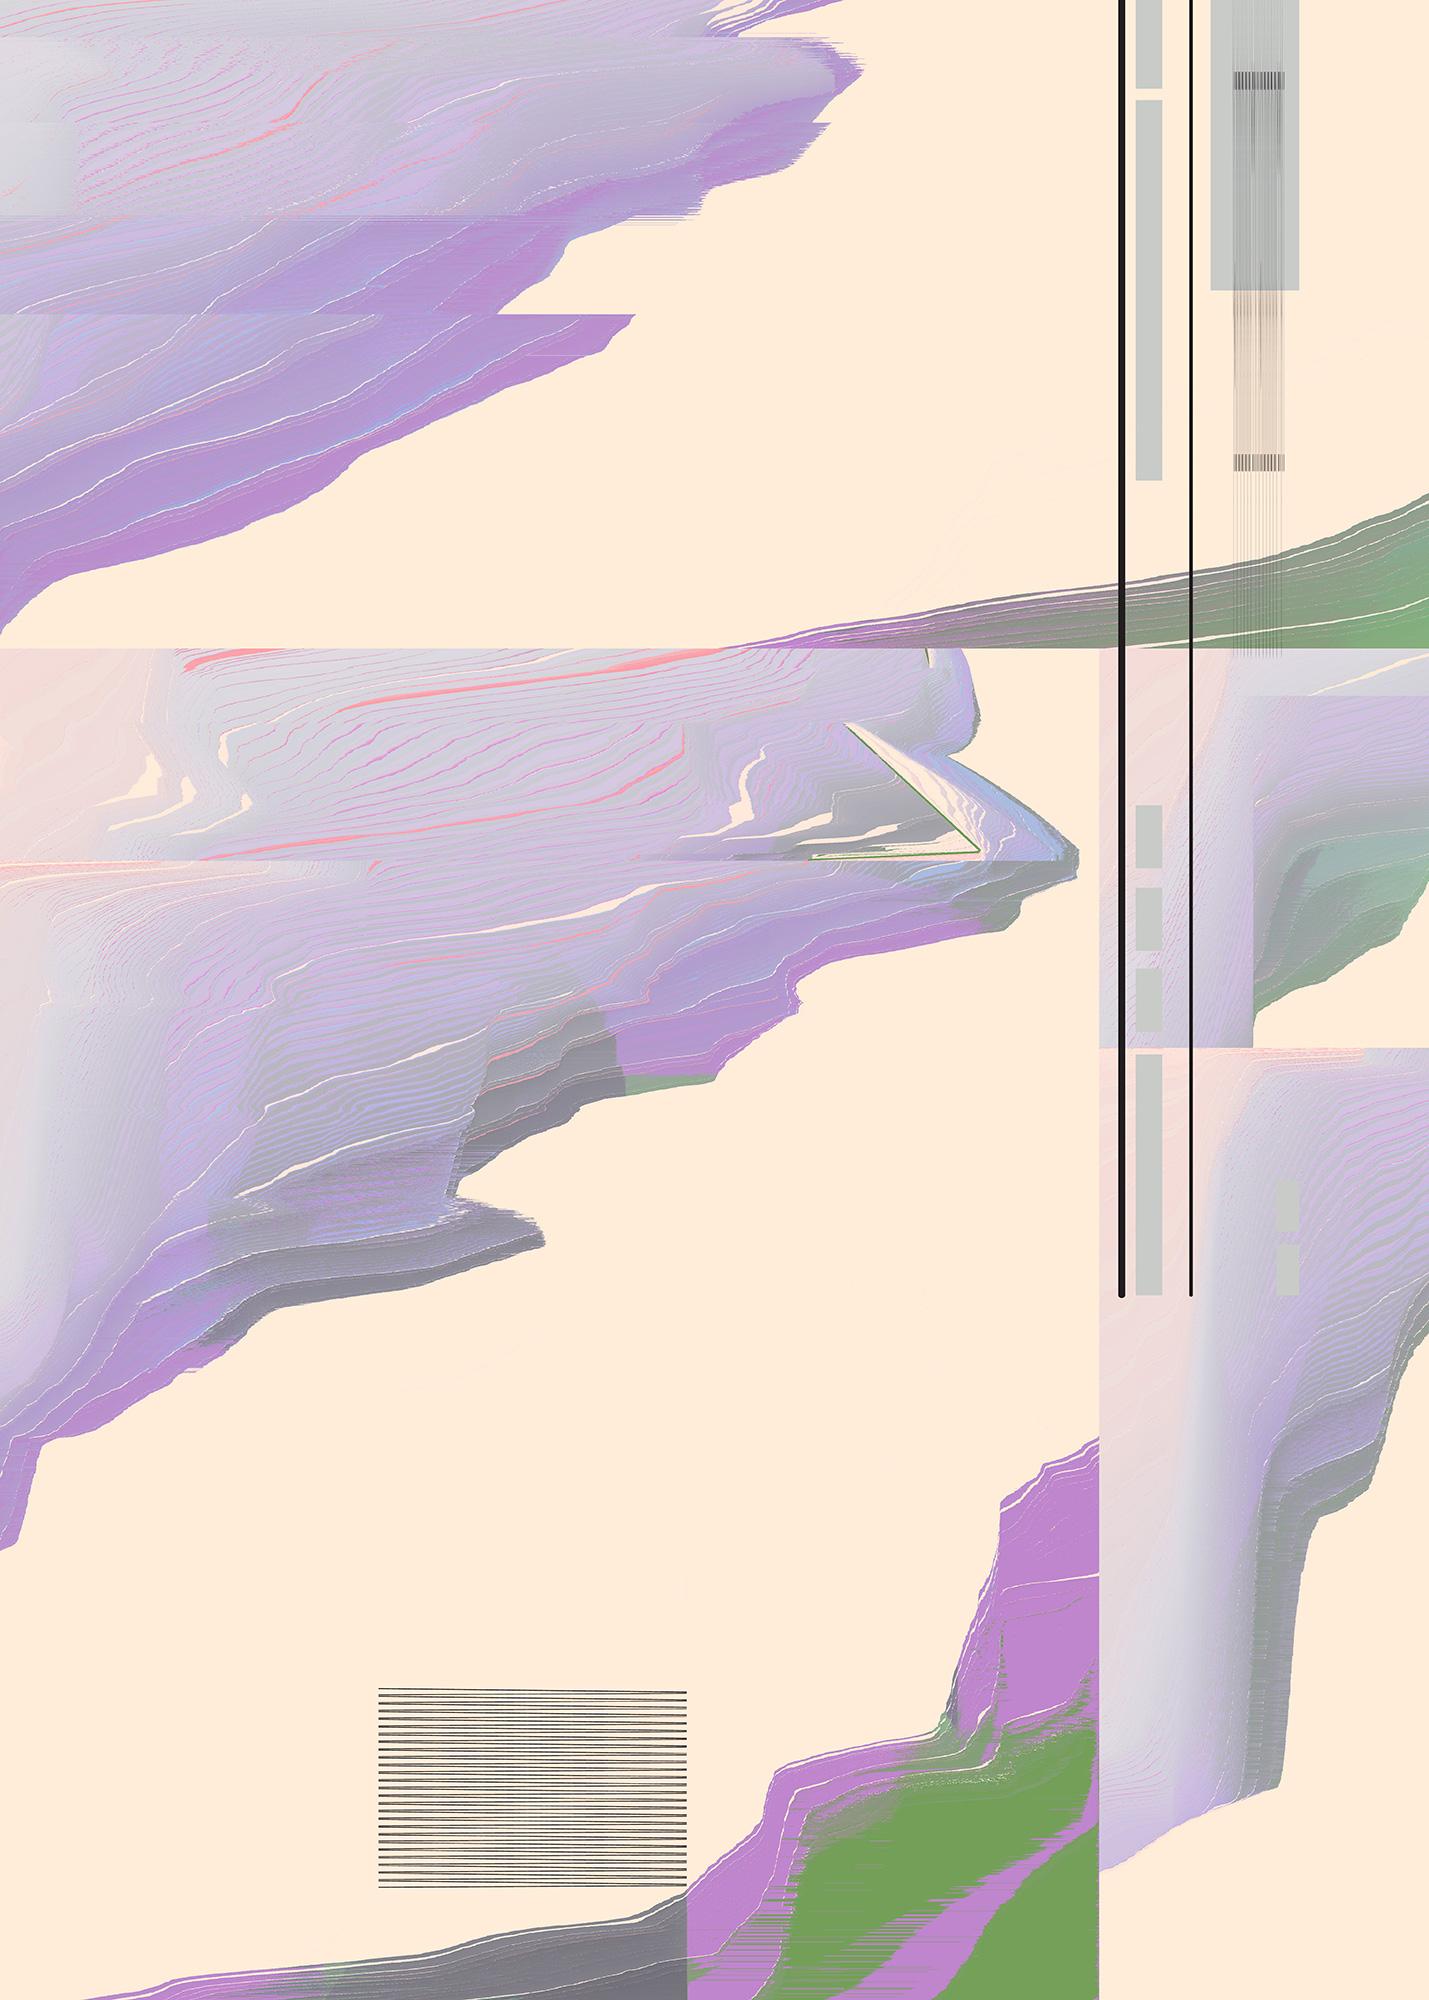 Ewa Doroszenko – Composition with the Sun online 01, obraz